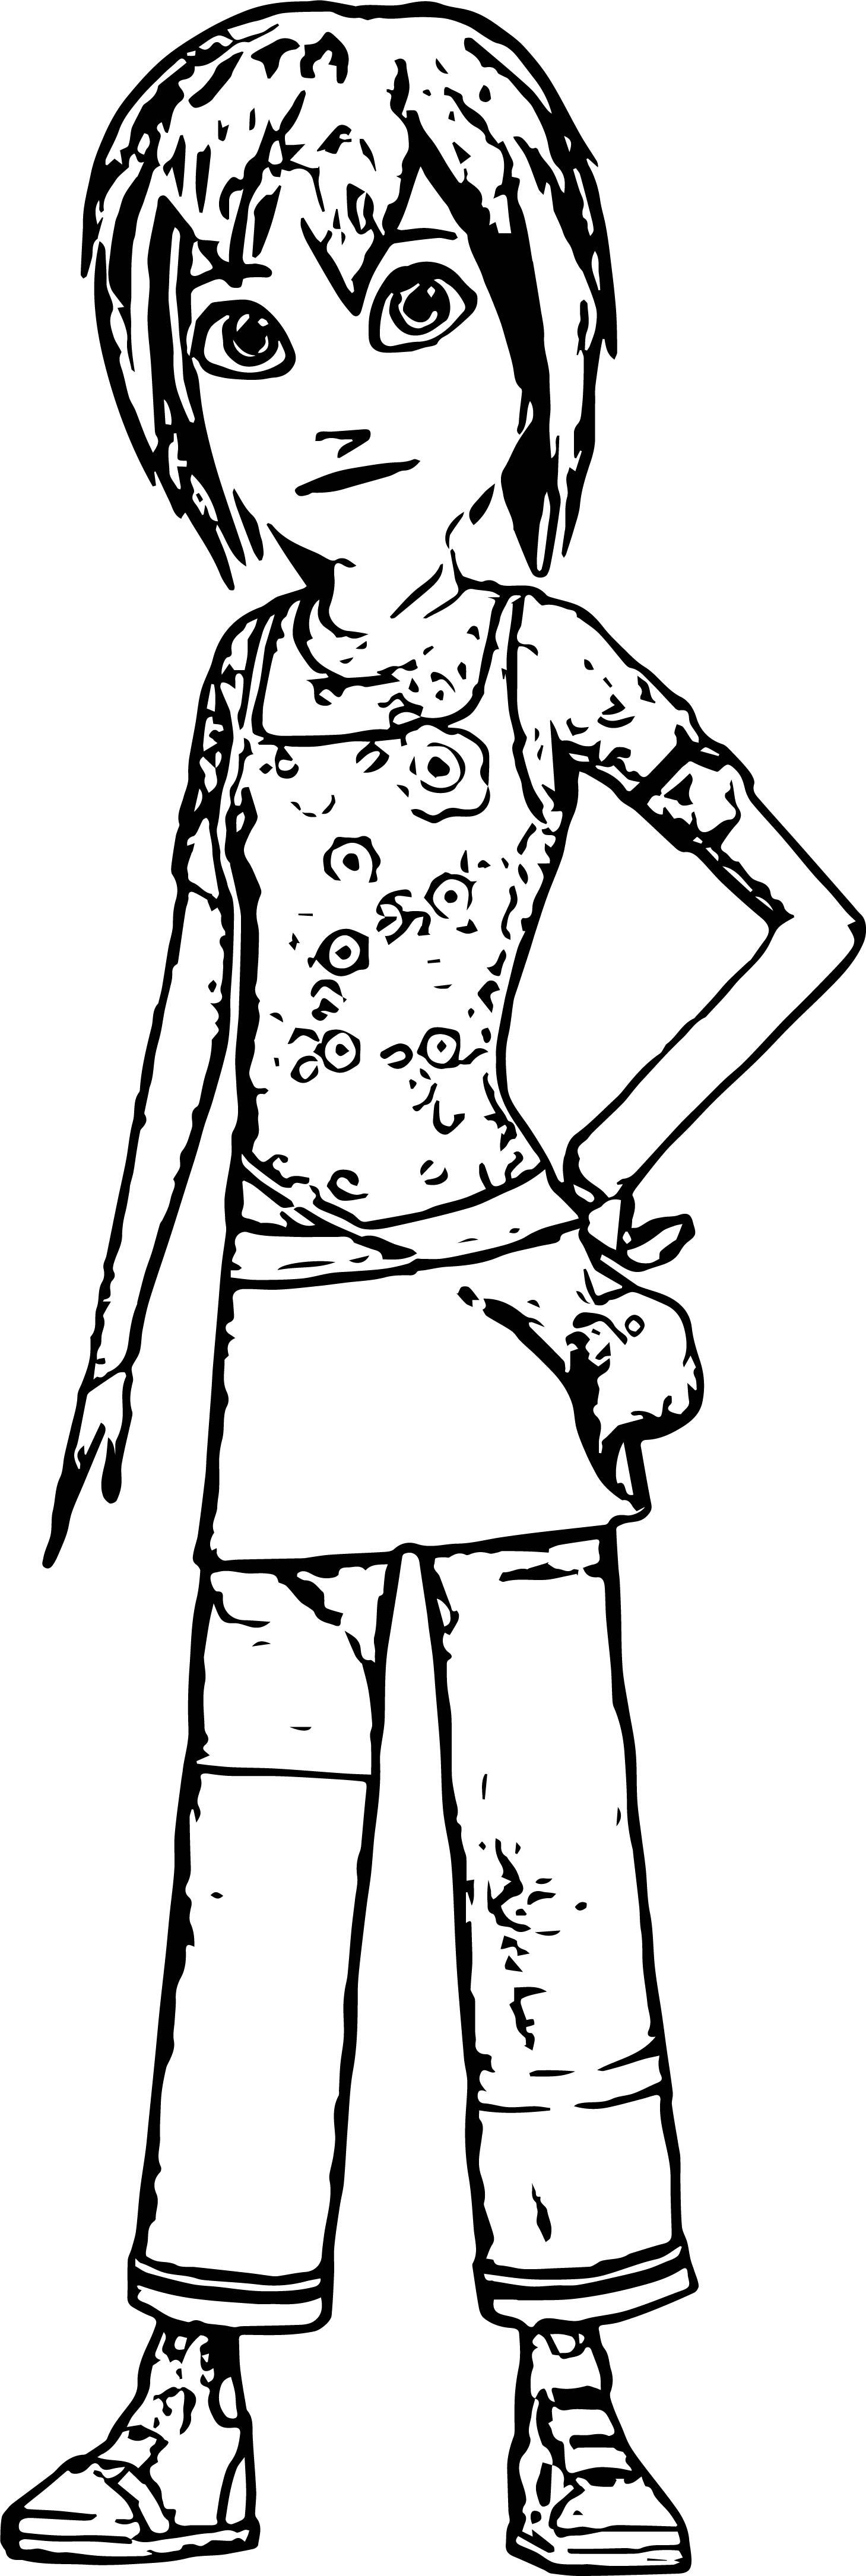 Astro Boy Girl Coloring Page